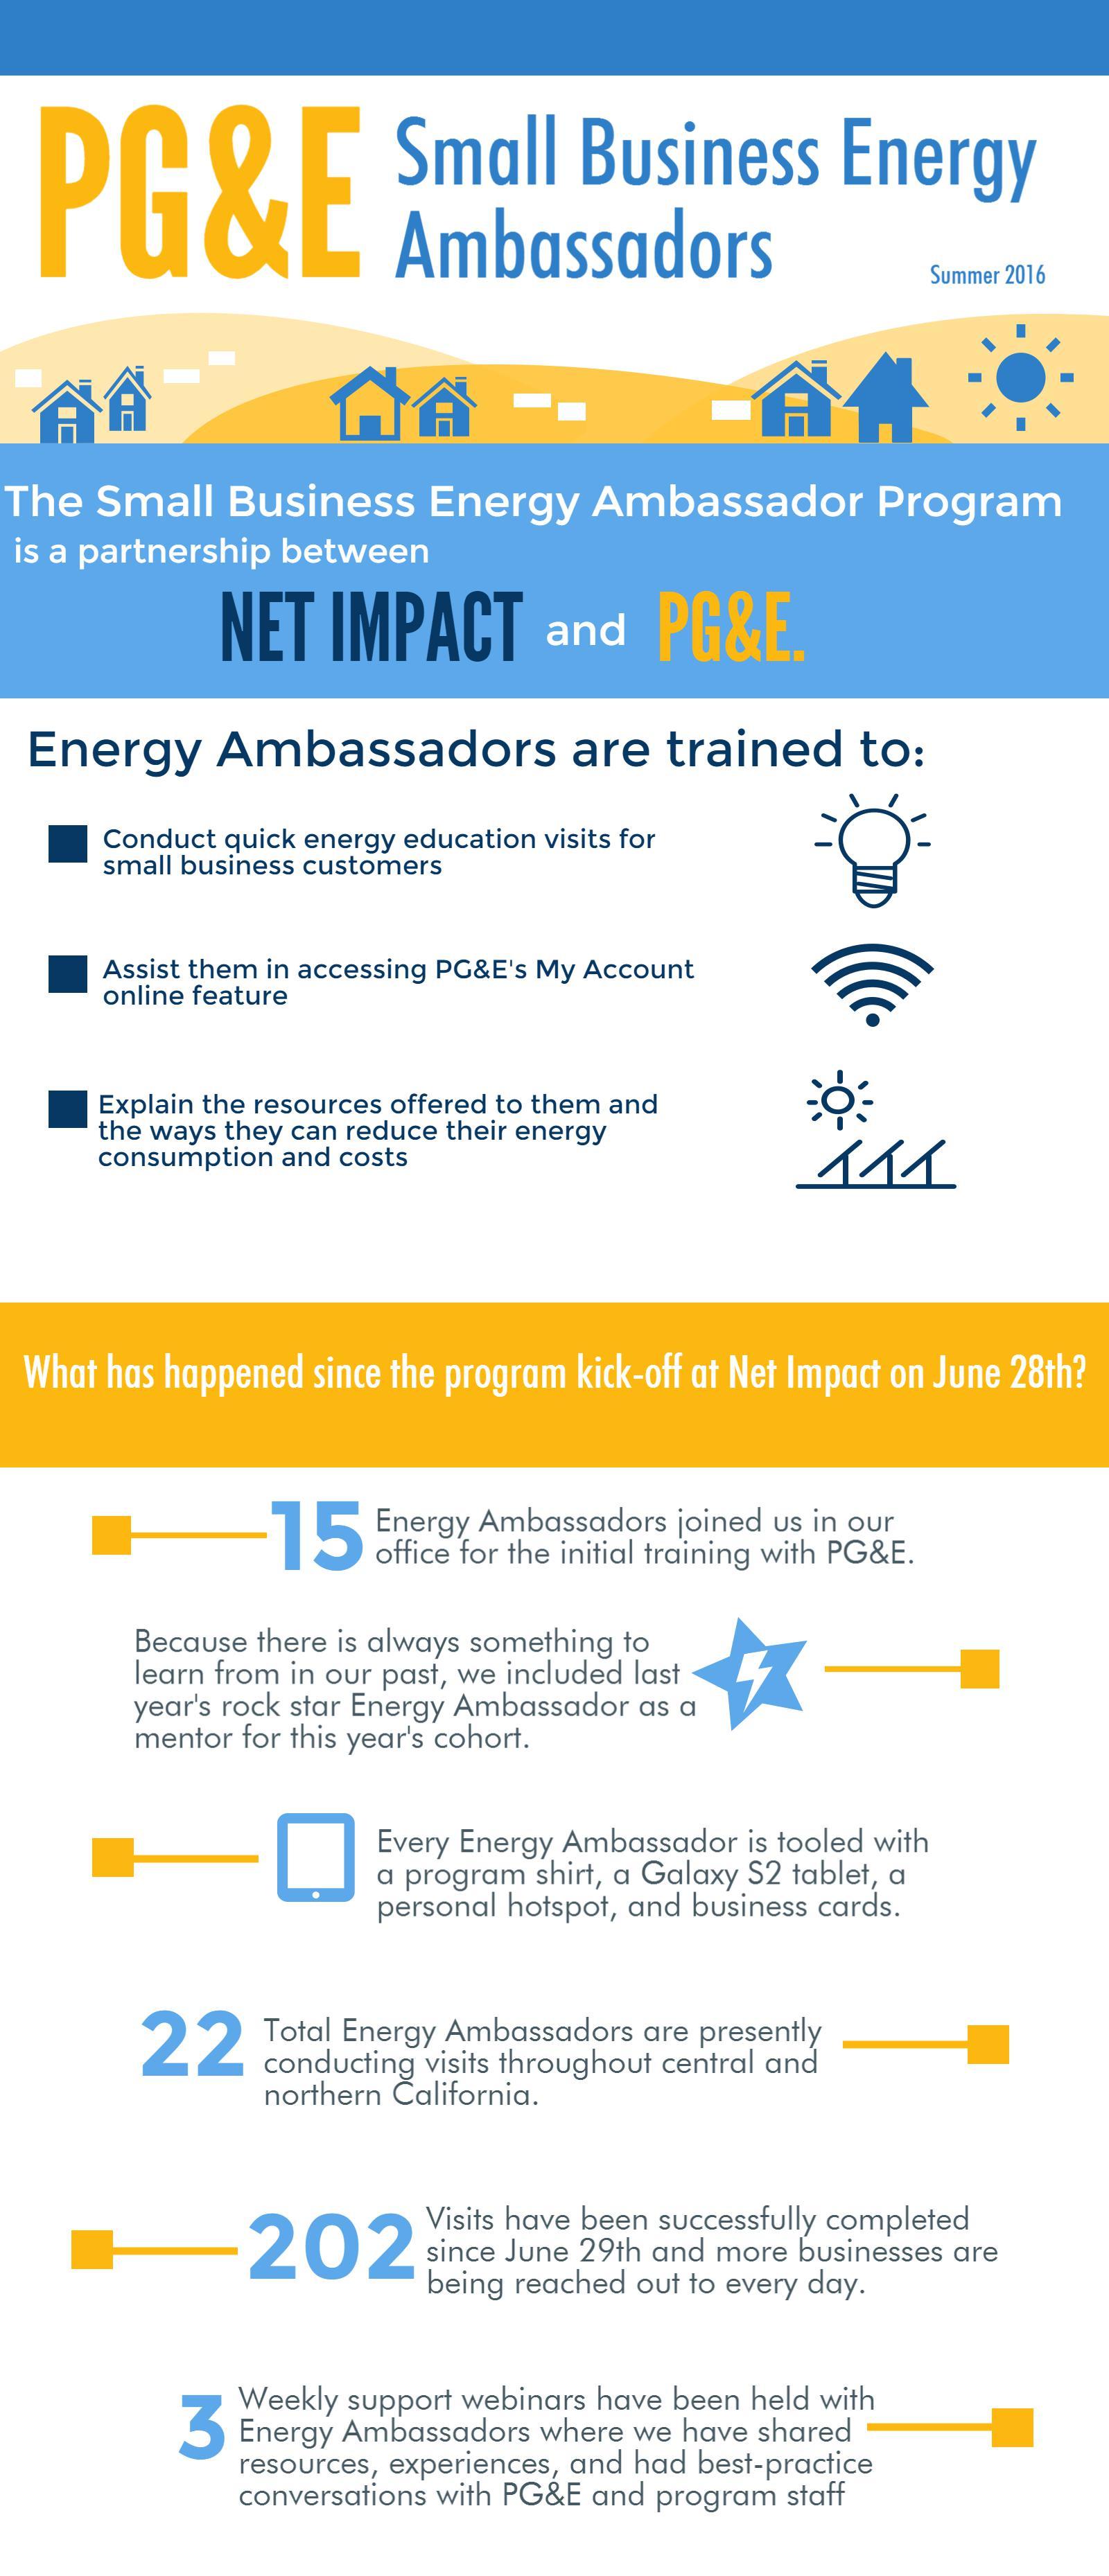 PG&E Small Business Energy Ambassadors